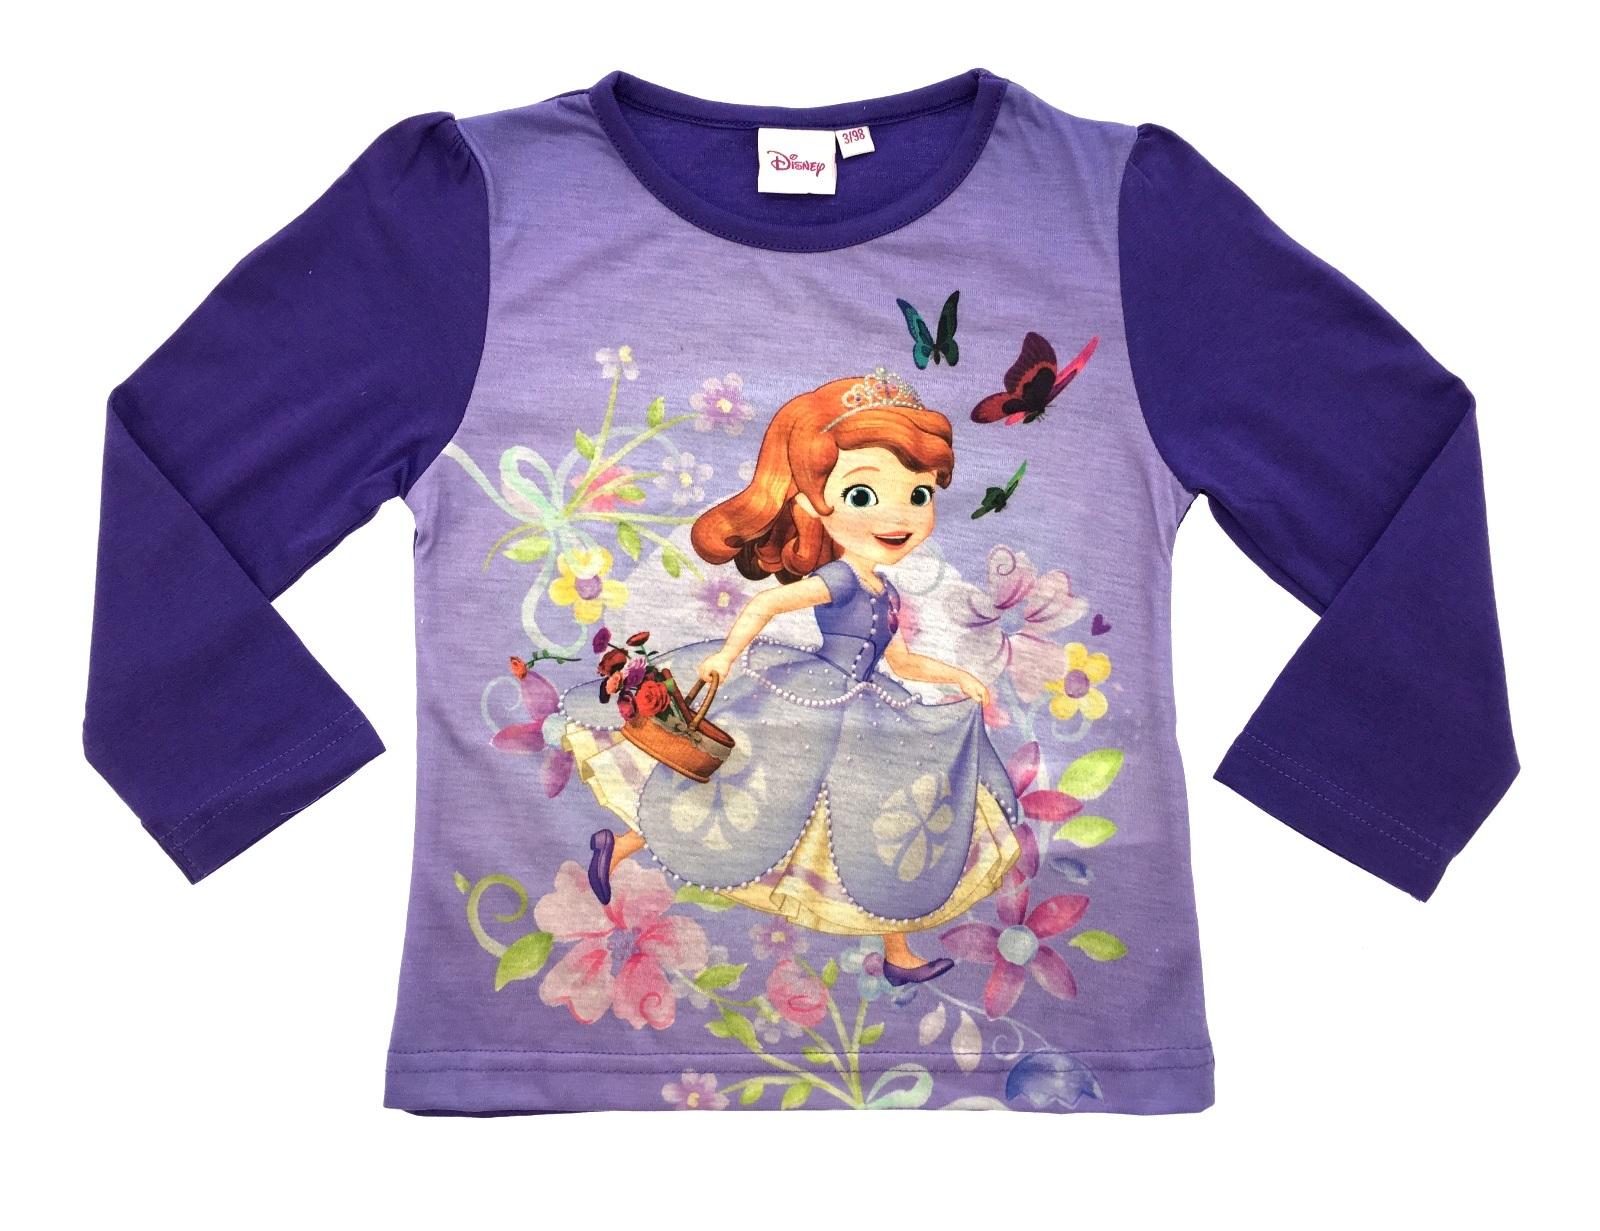 Disney princess sofia 100 cotton long sleeve t shirt for Best shirts for girls